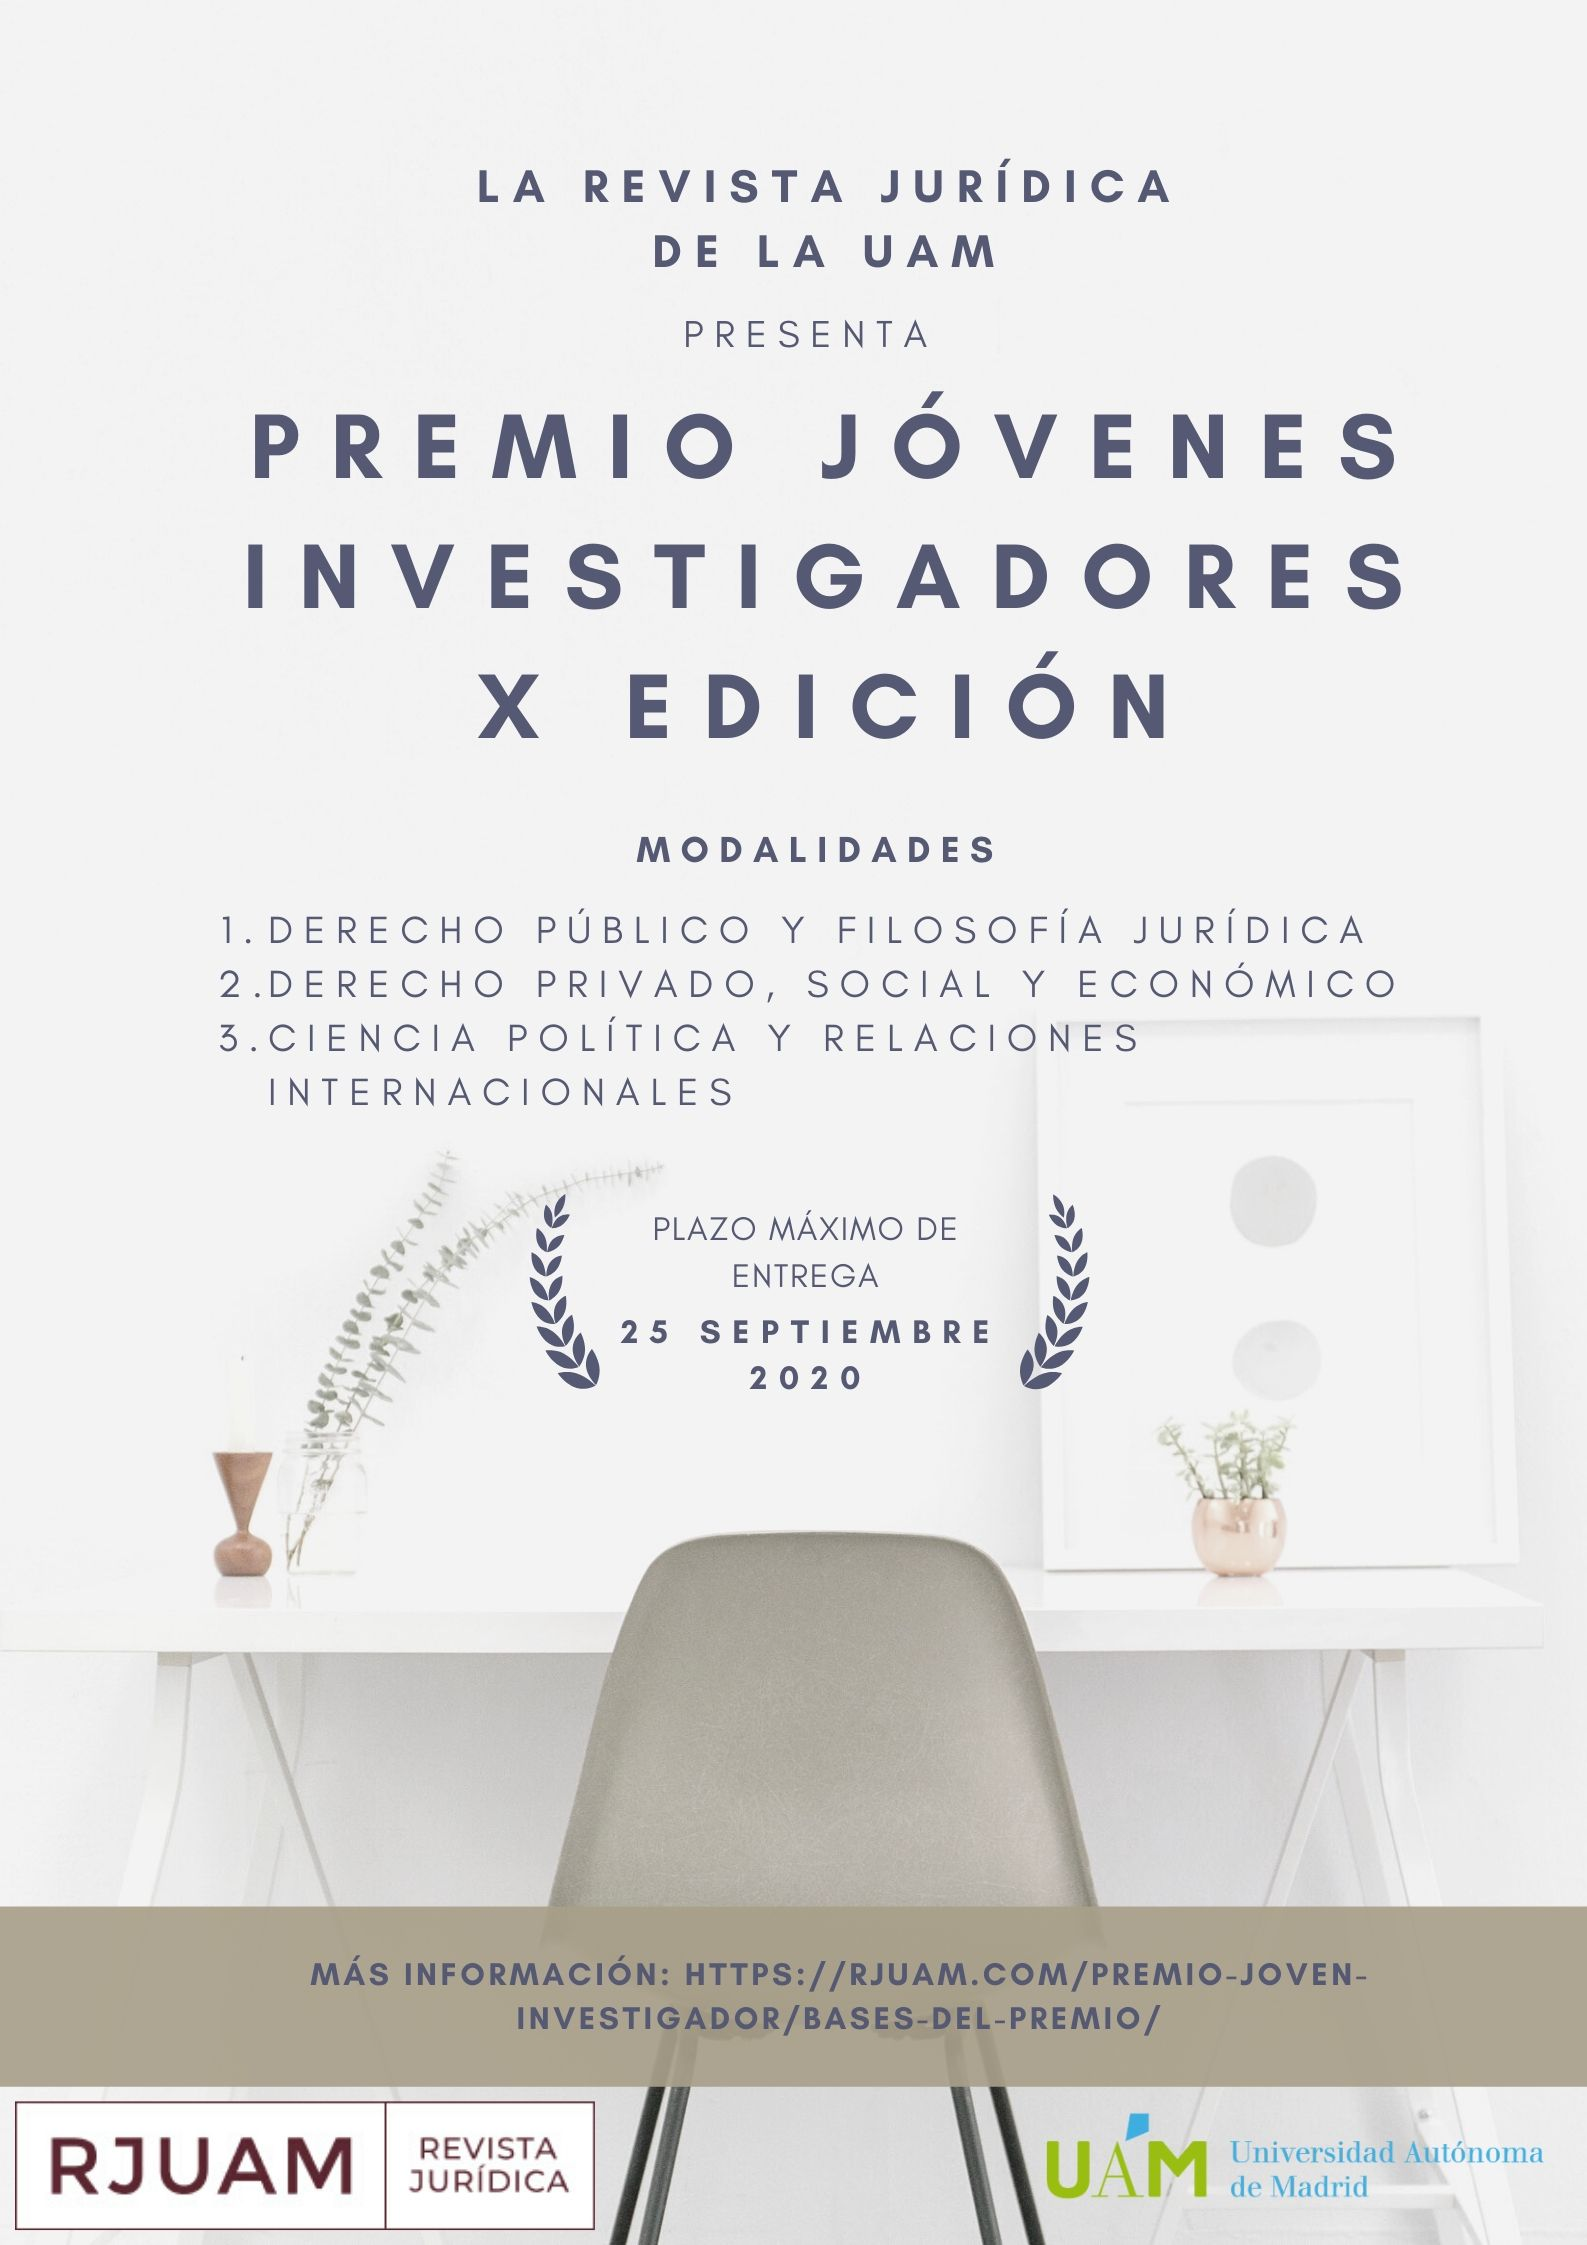 PremioJovenInvestig(2)